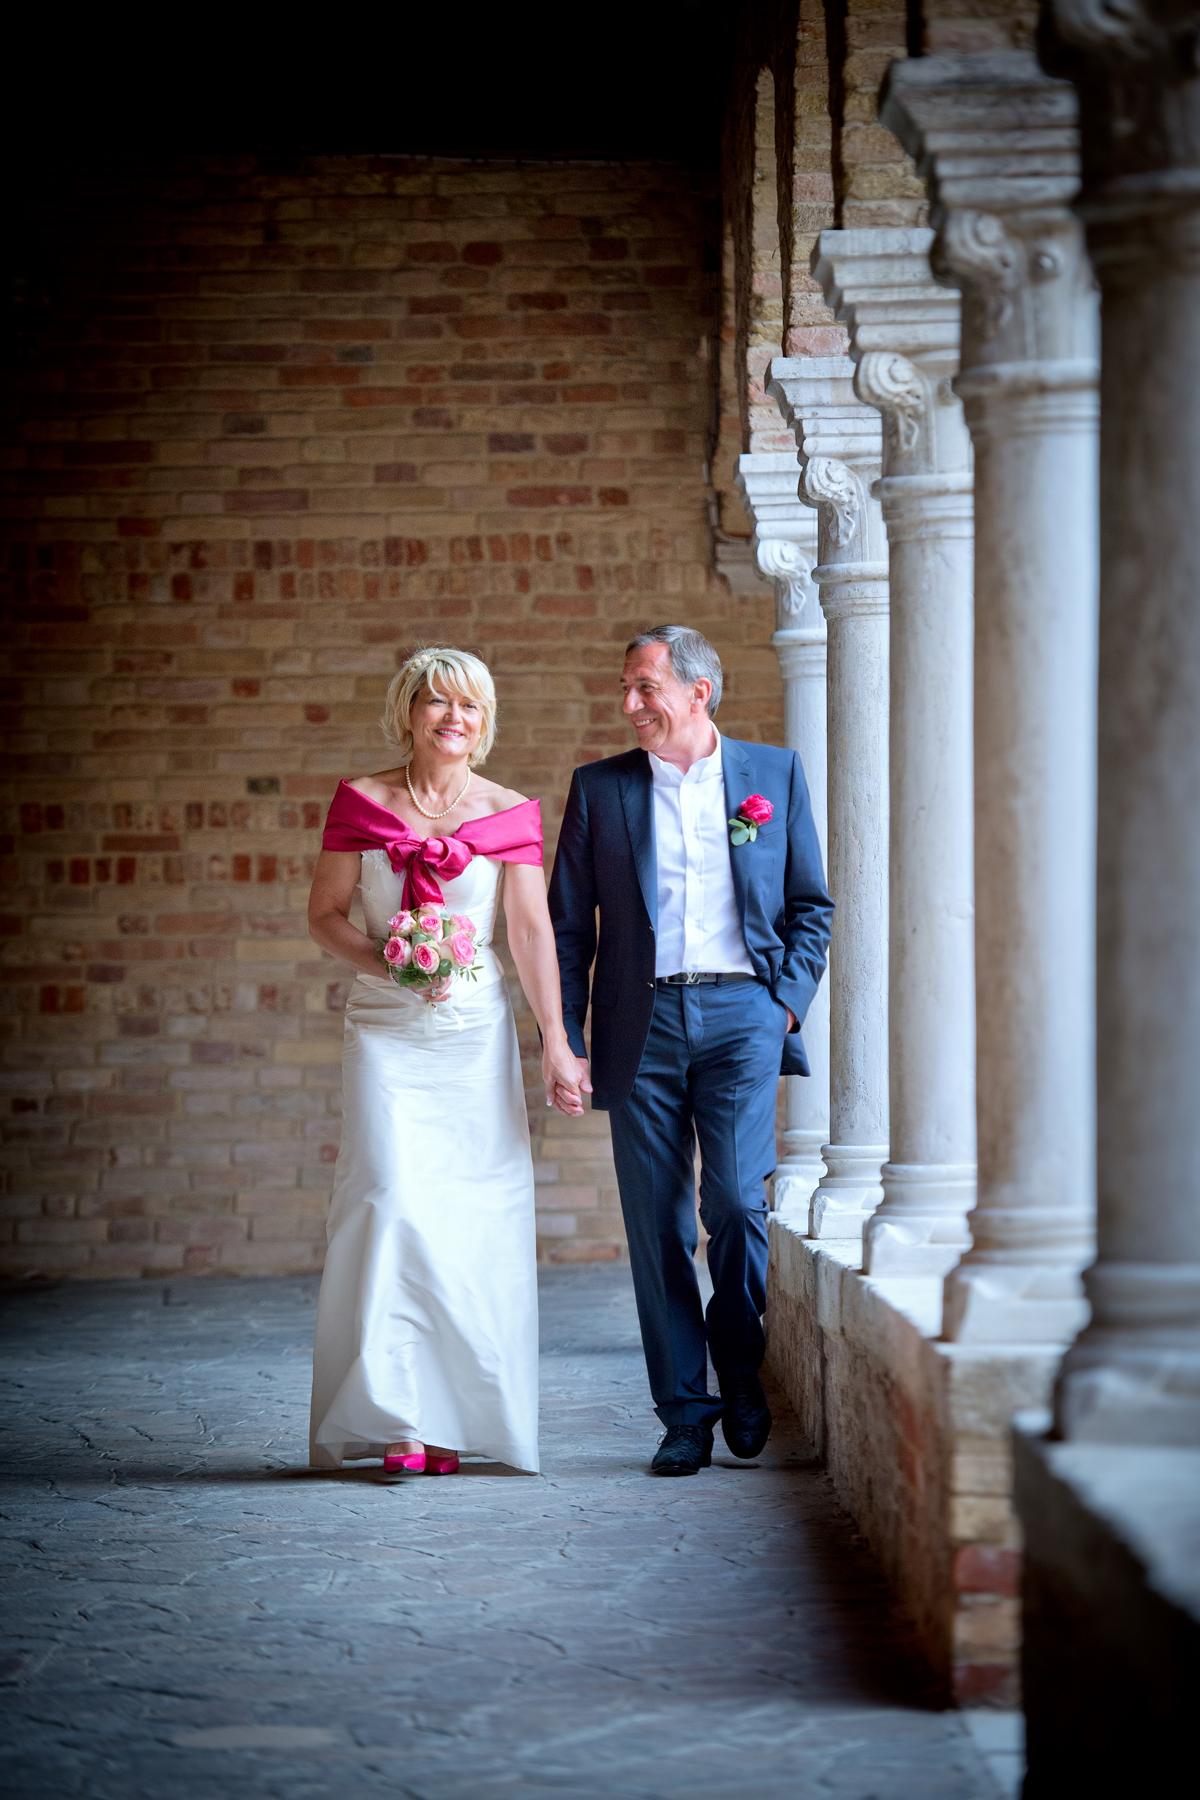 photographer wedding venice photographe mariage venise laure jacquemin (100).jpg